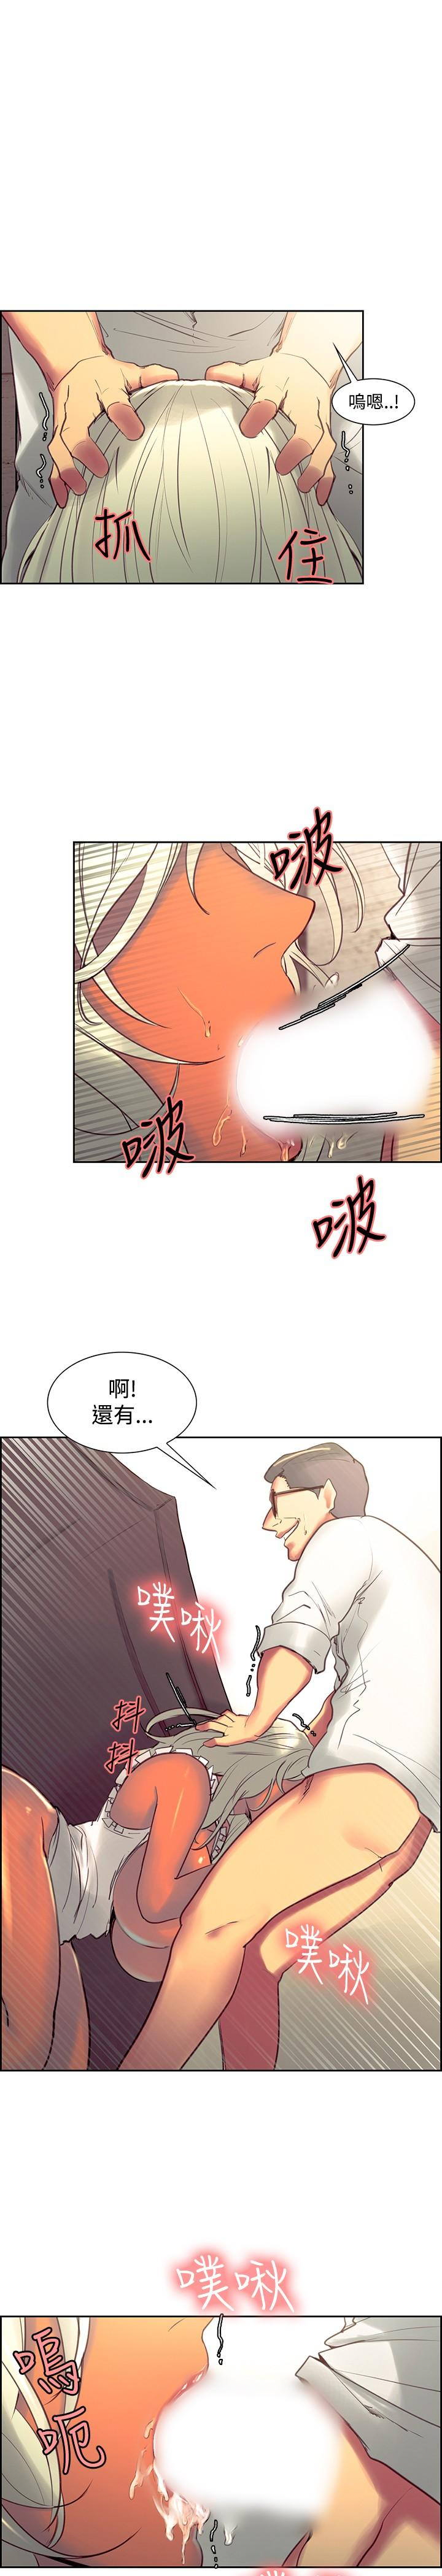 Domesticate the Housekeeper 调教家政妇 Ch.29~39 69